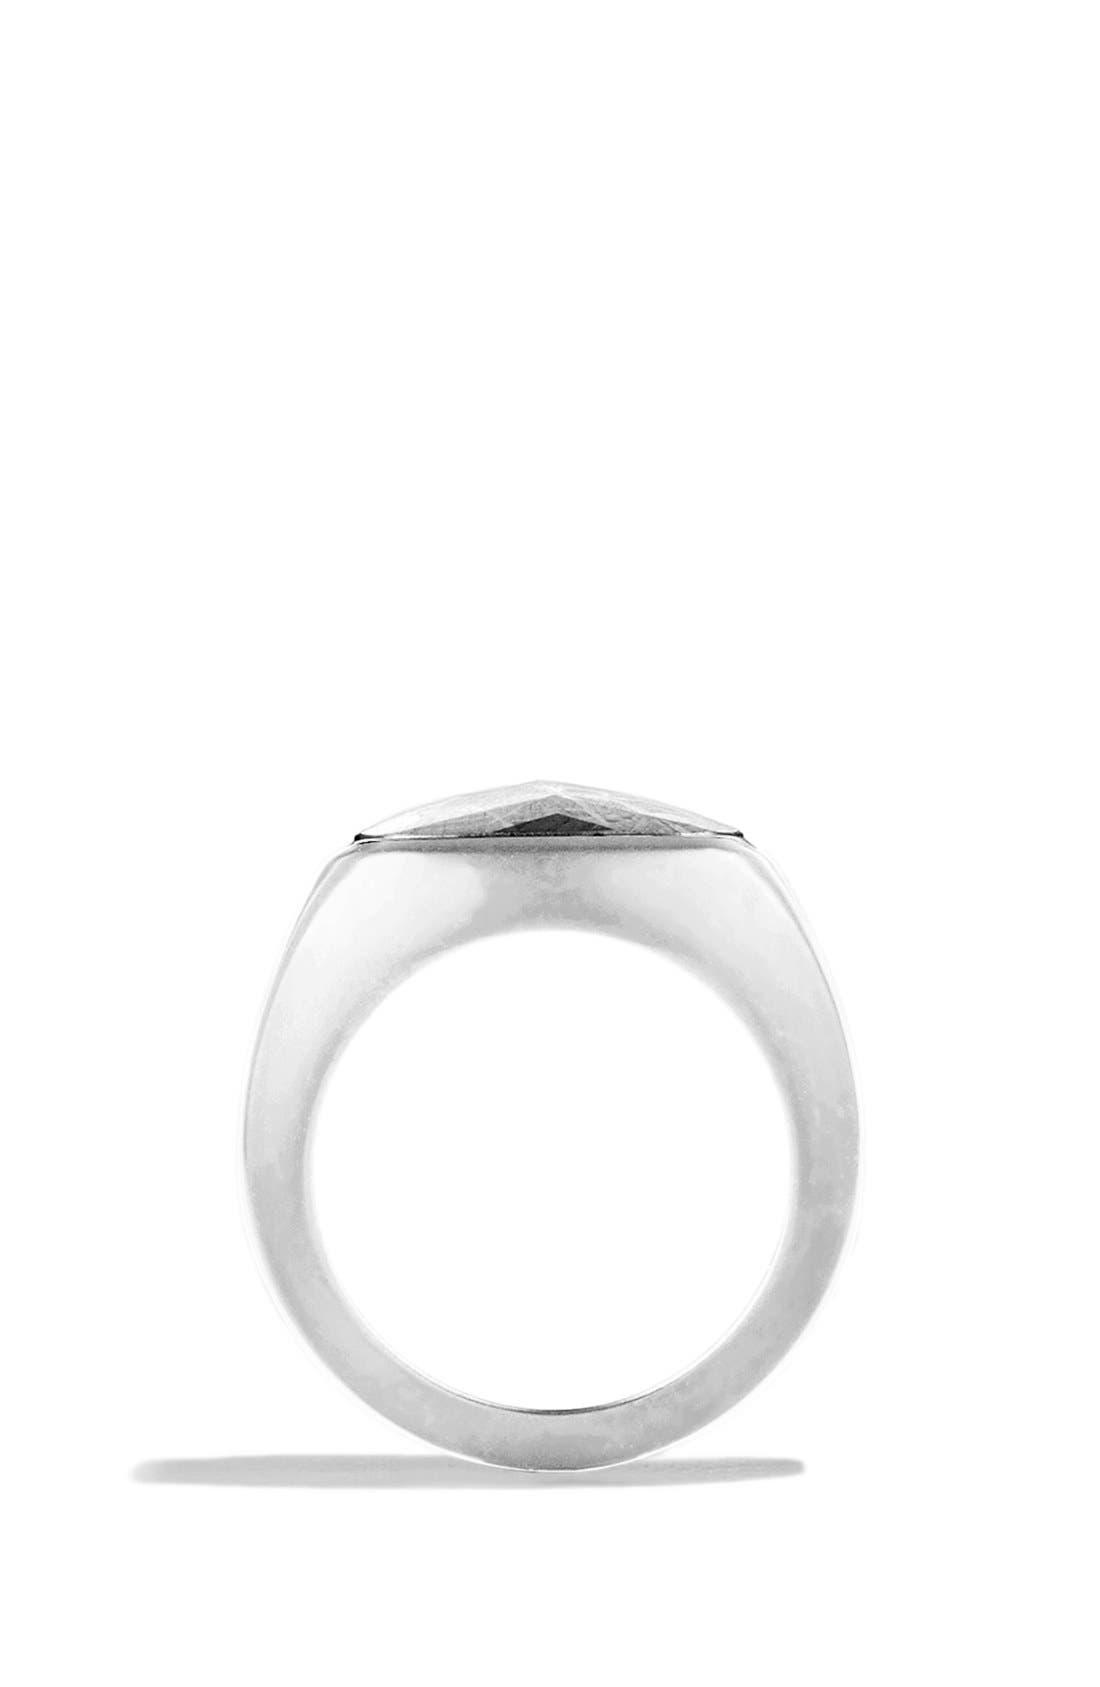 Signet Ring with Meteorite,                             Alternate thumbnail 4, color,                             Meteorite